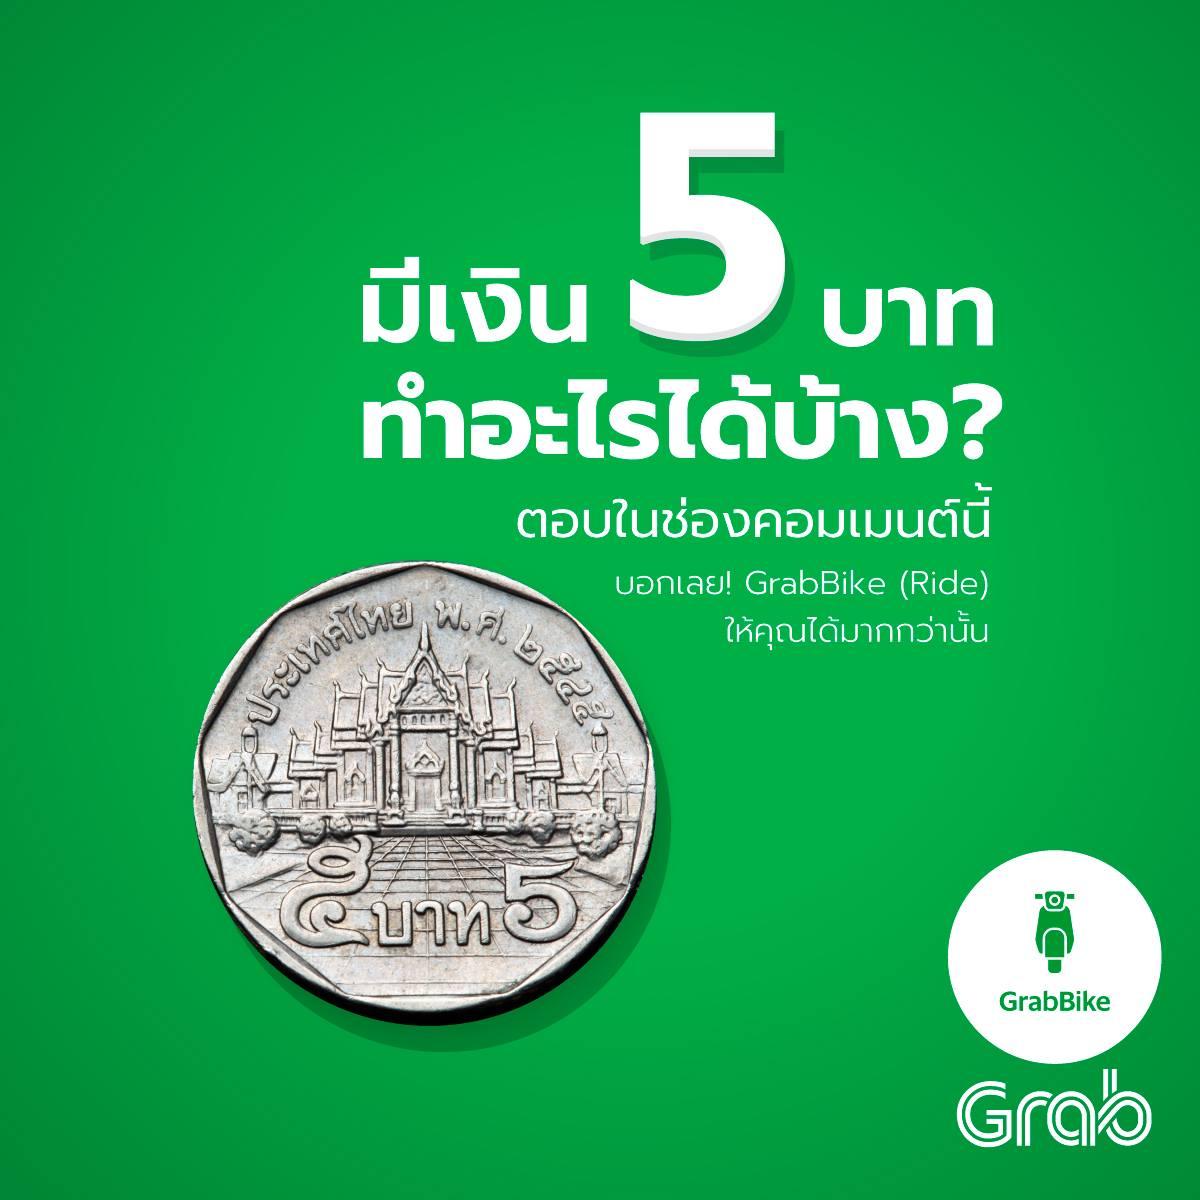 GrabBike-Promotion-5-Baht-00003